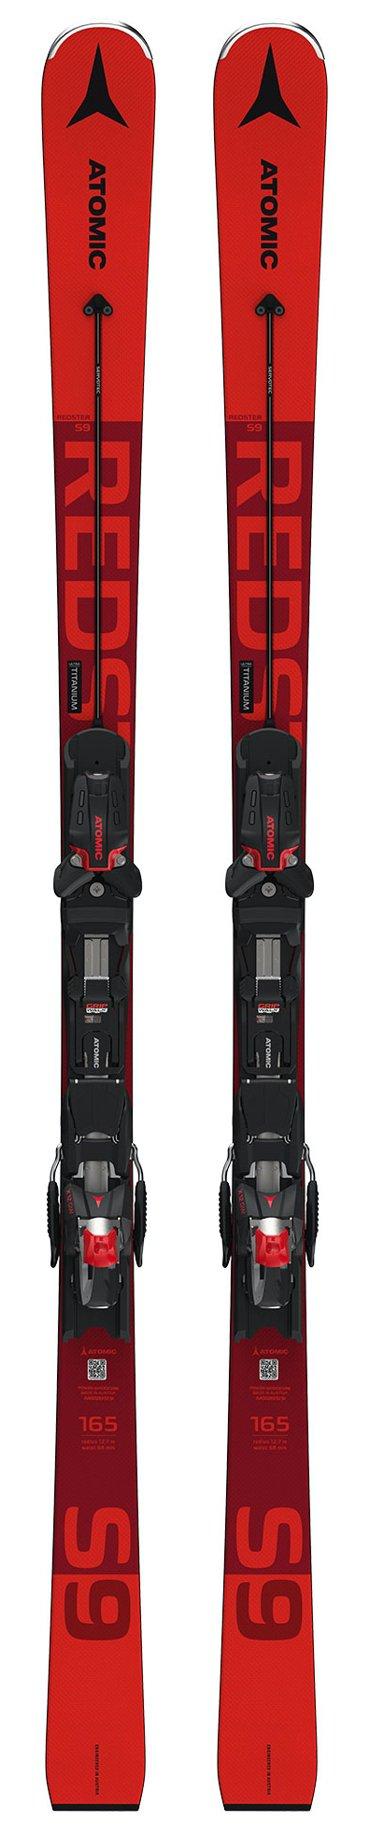 Atomic Redster S9 + X 12 GW 159 cm